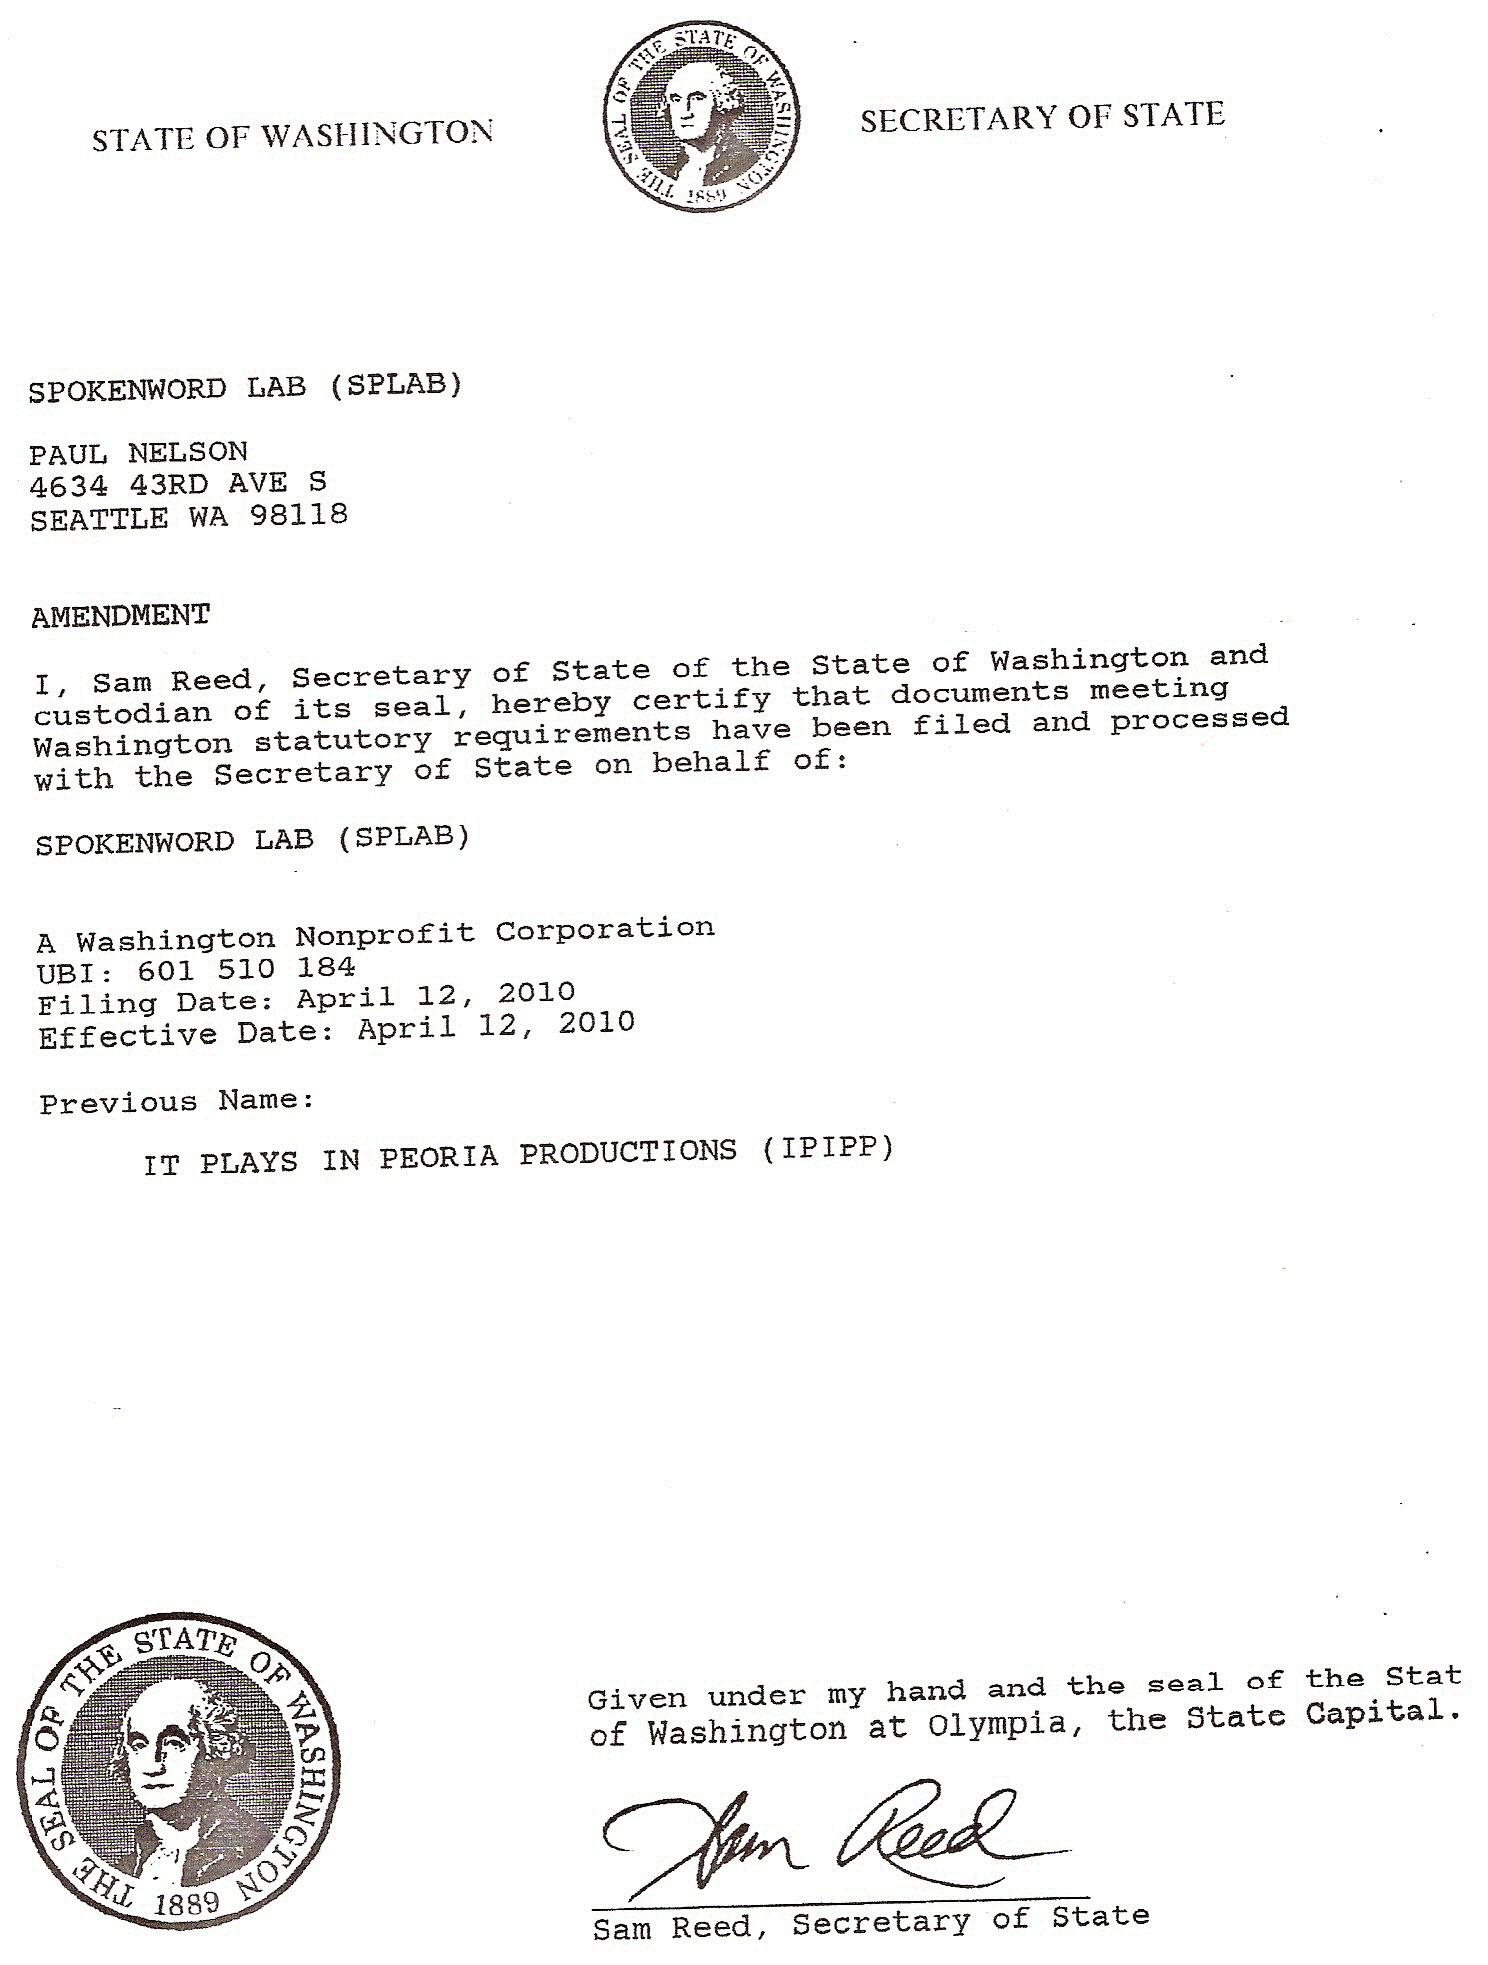 Secretary of State Determination Letter